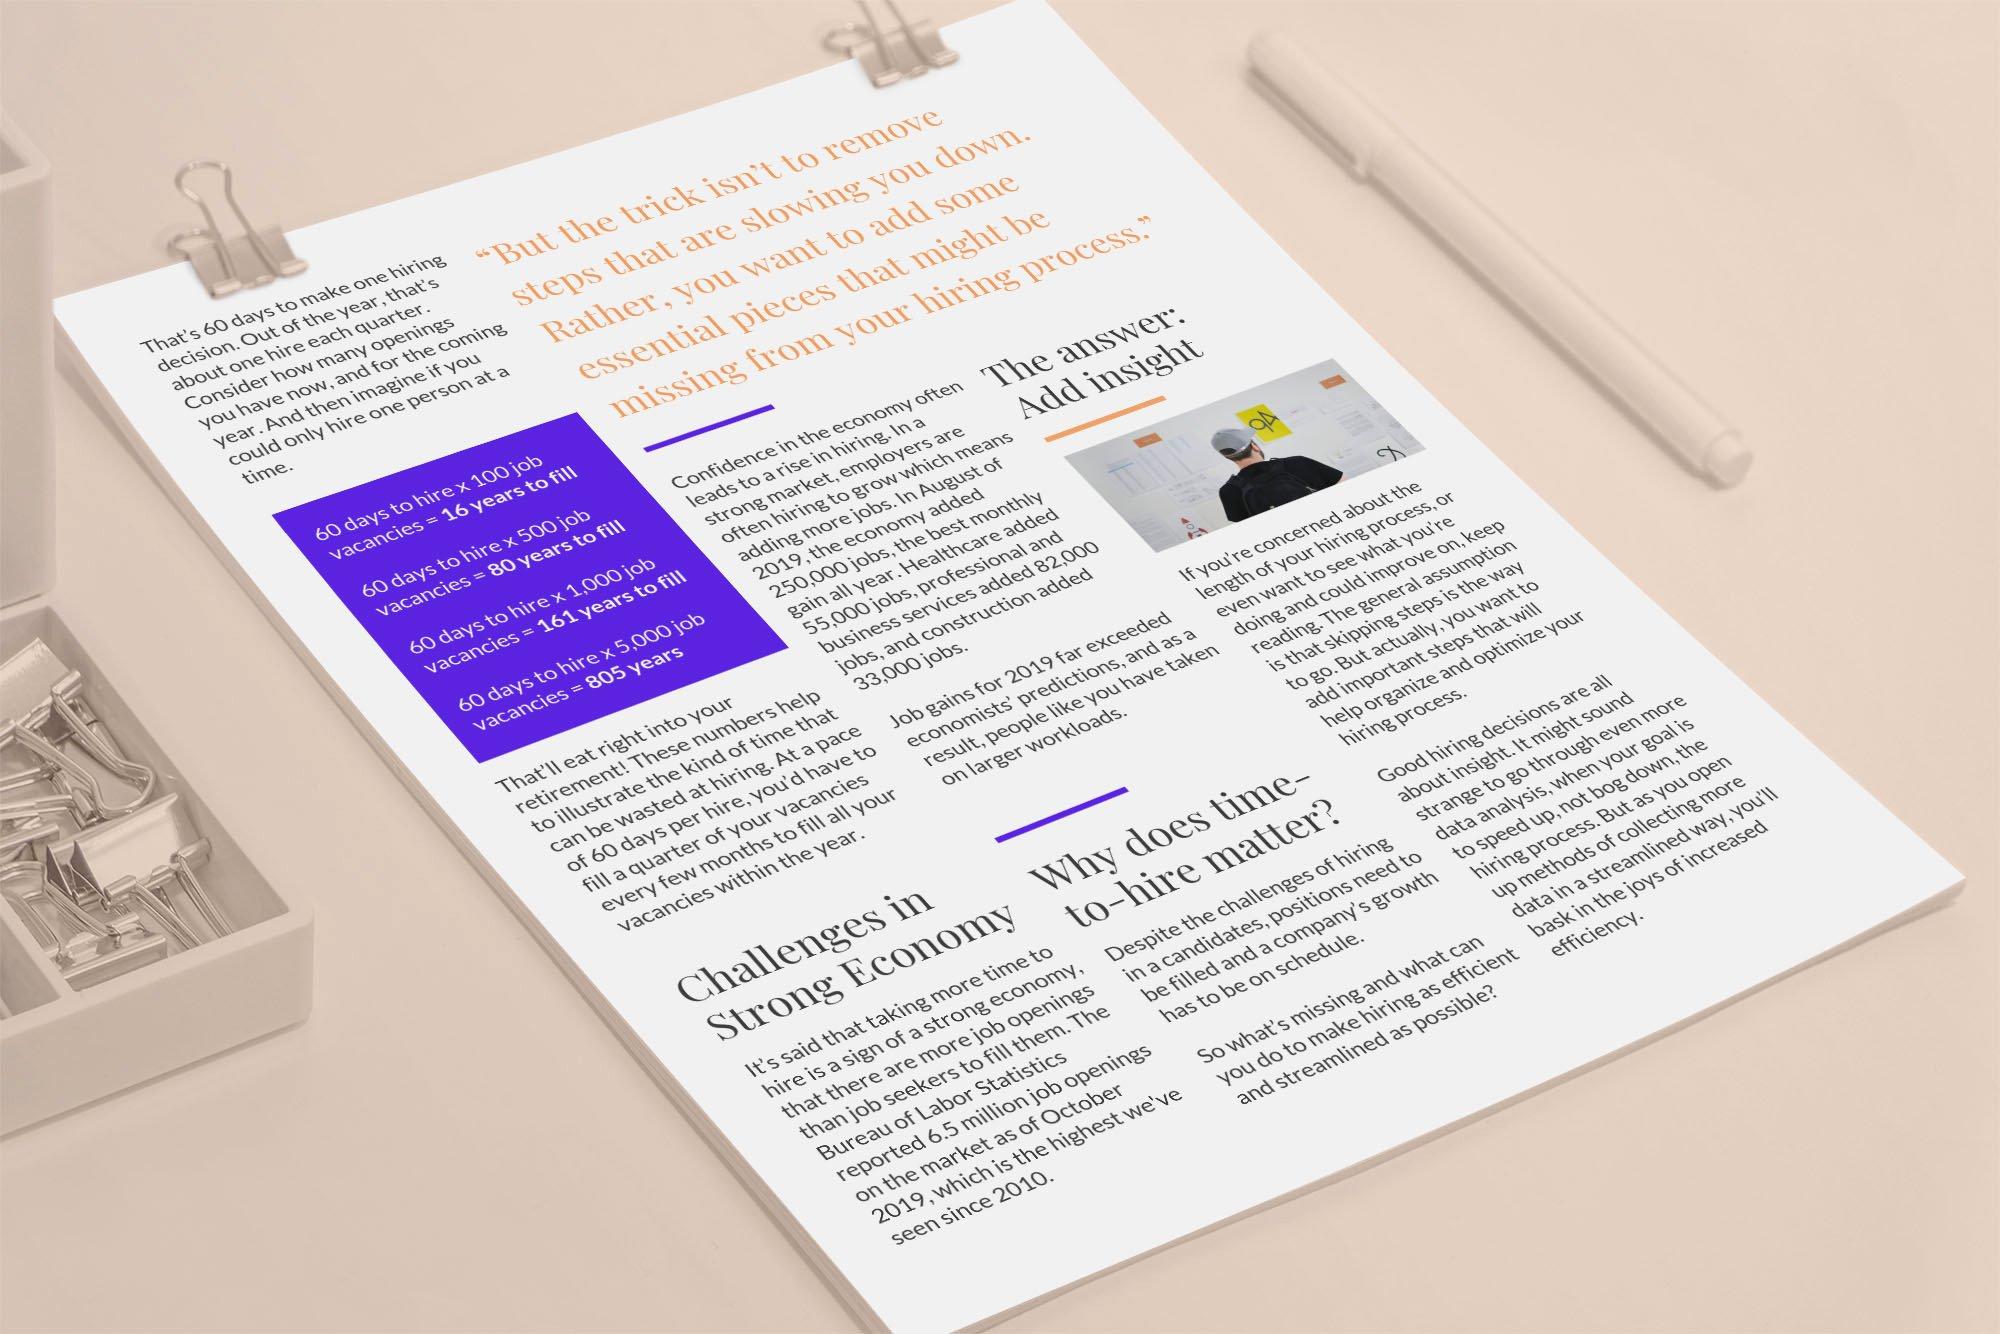 White Paper Design Template Elegant 20 Page Turning White Paper Examples [design Guide White Paper Templates] Venngage